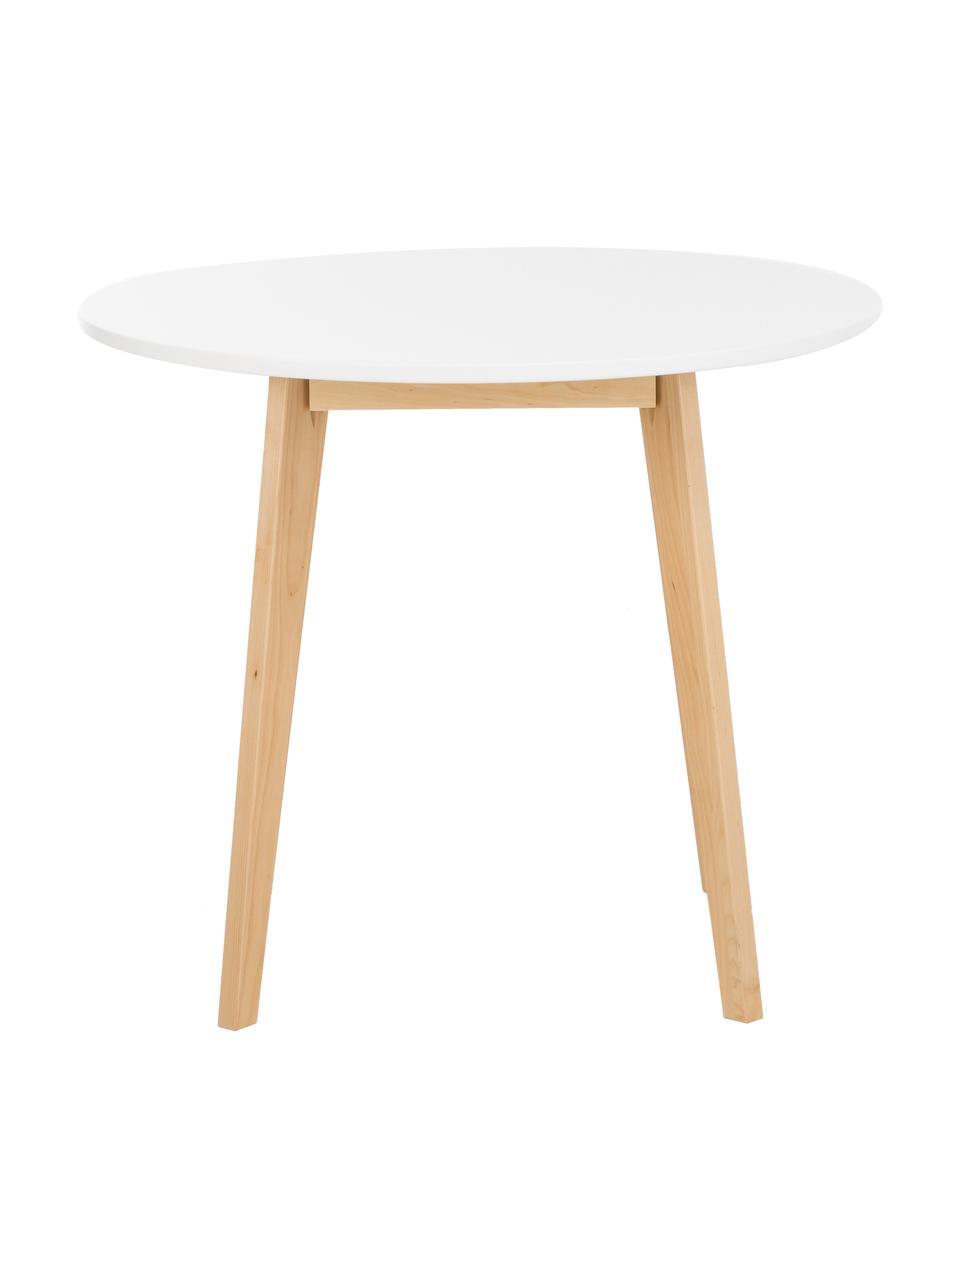 petite table ronde scandinave raven